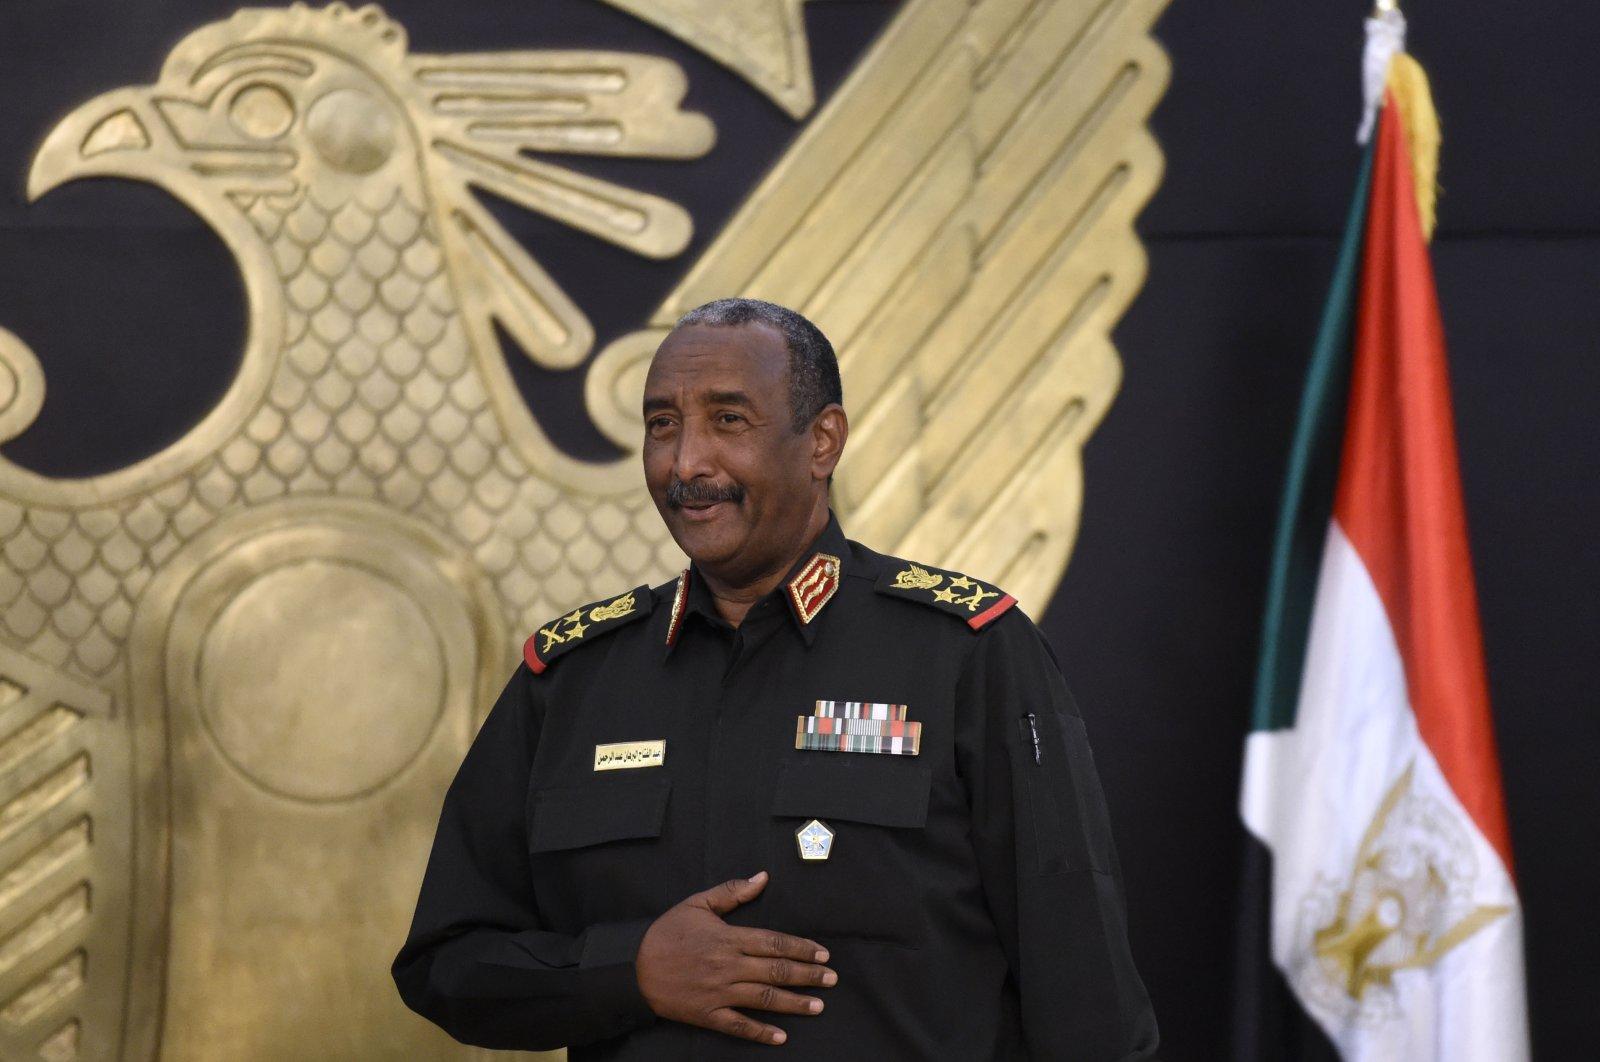 Gen. Abdel-Fattah Burhan, Sudan's head of the Transitional Military Council, meets with Bahraini aid officials in Sudan's capital Khartoum, Sept. 15, 2020. (AFP Photo)